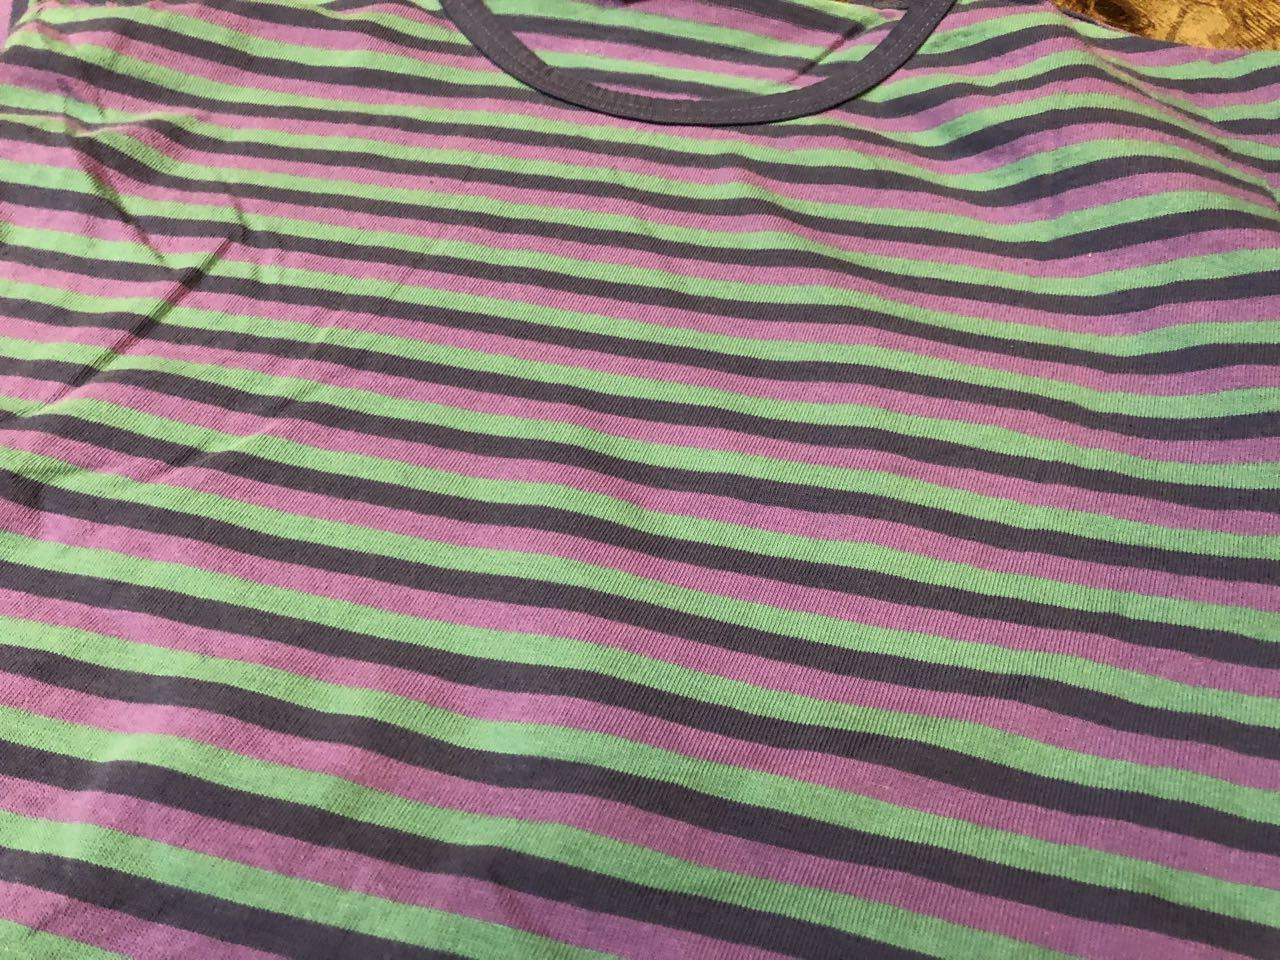 7月20日(土)入荷!80s MADE IN U.S.A all cotton LANDS \' END ボーダーTシャツ! _c0144020_14062131.jpg